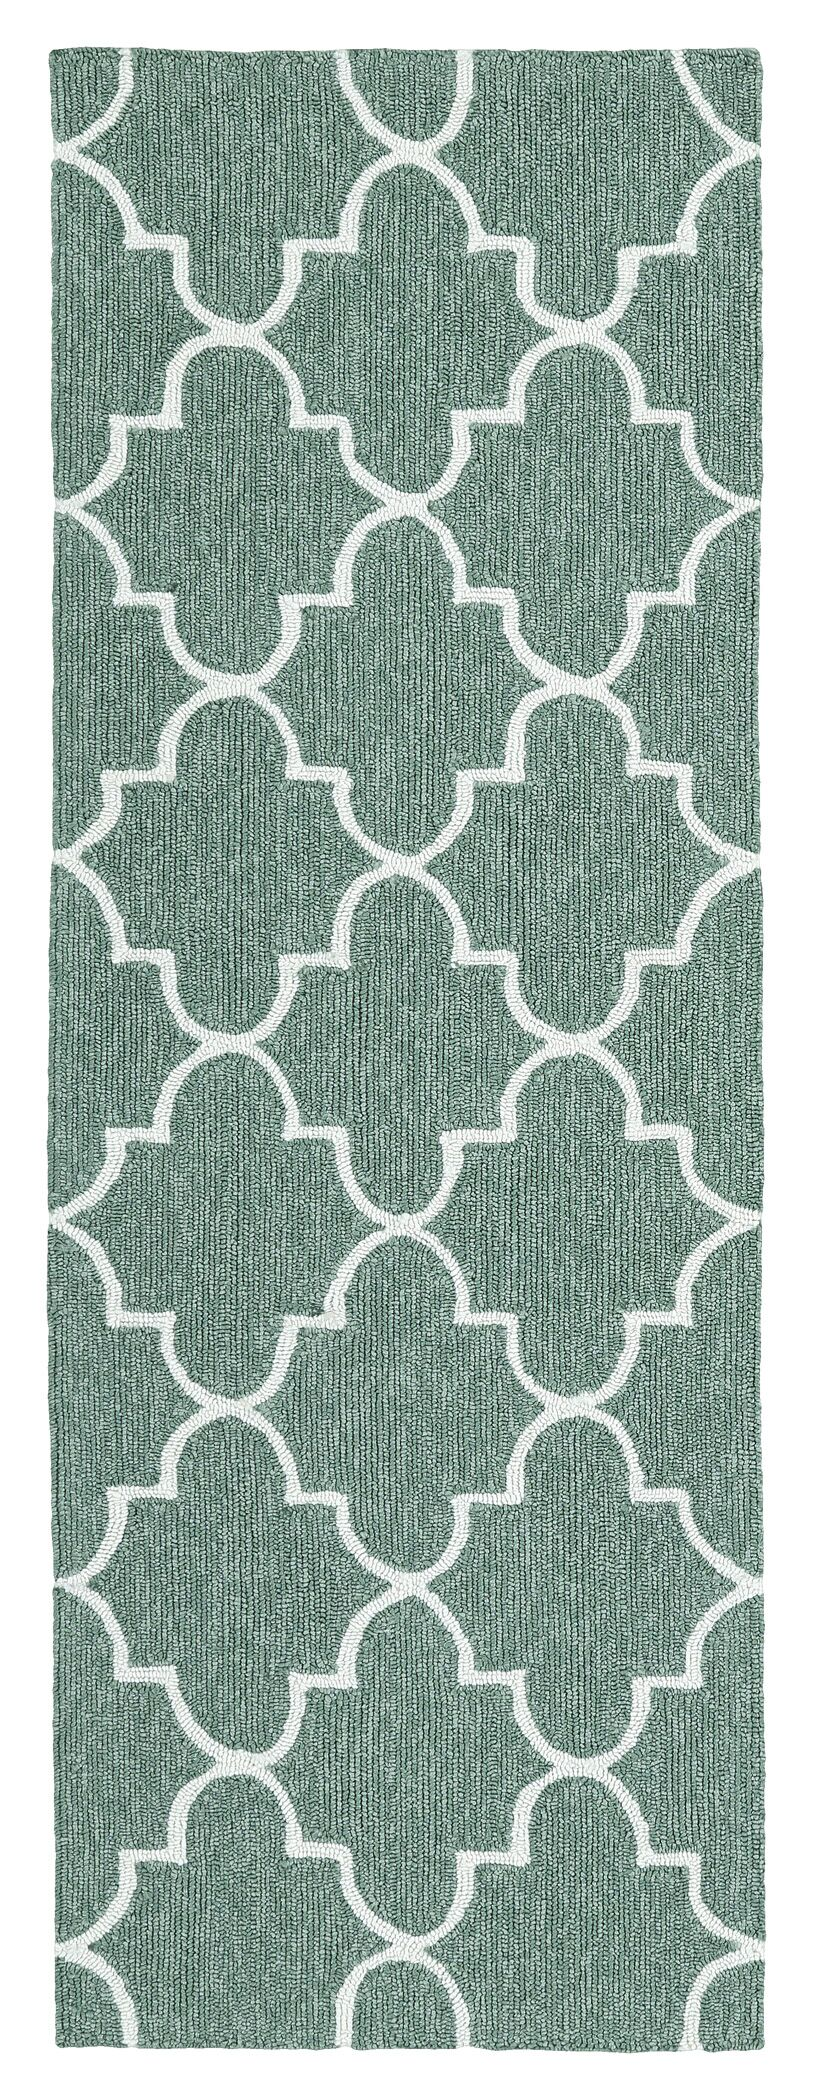 Cowan Hand-Tufted Mint Indoor/Outdoor Area Rug Rug Size: Rectangle 5' x 7'6